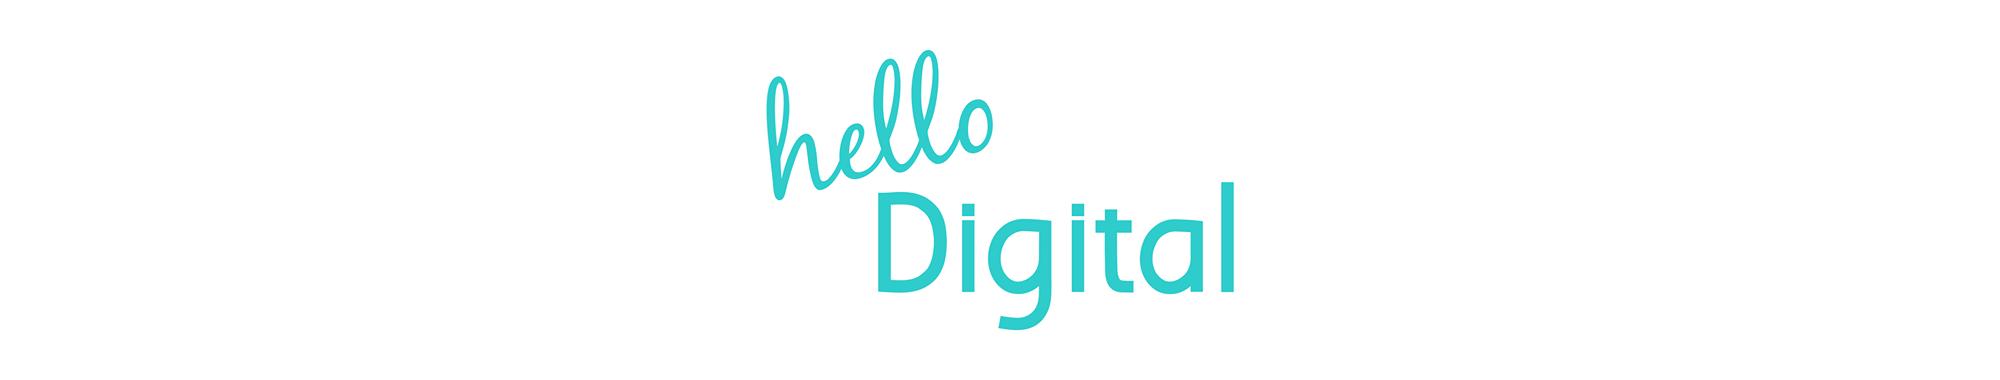 hello digital